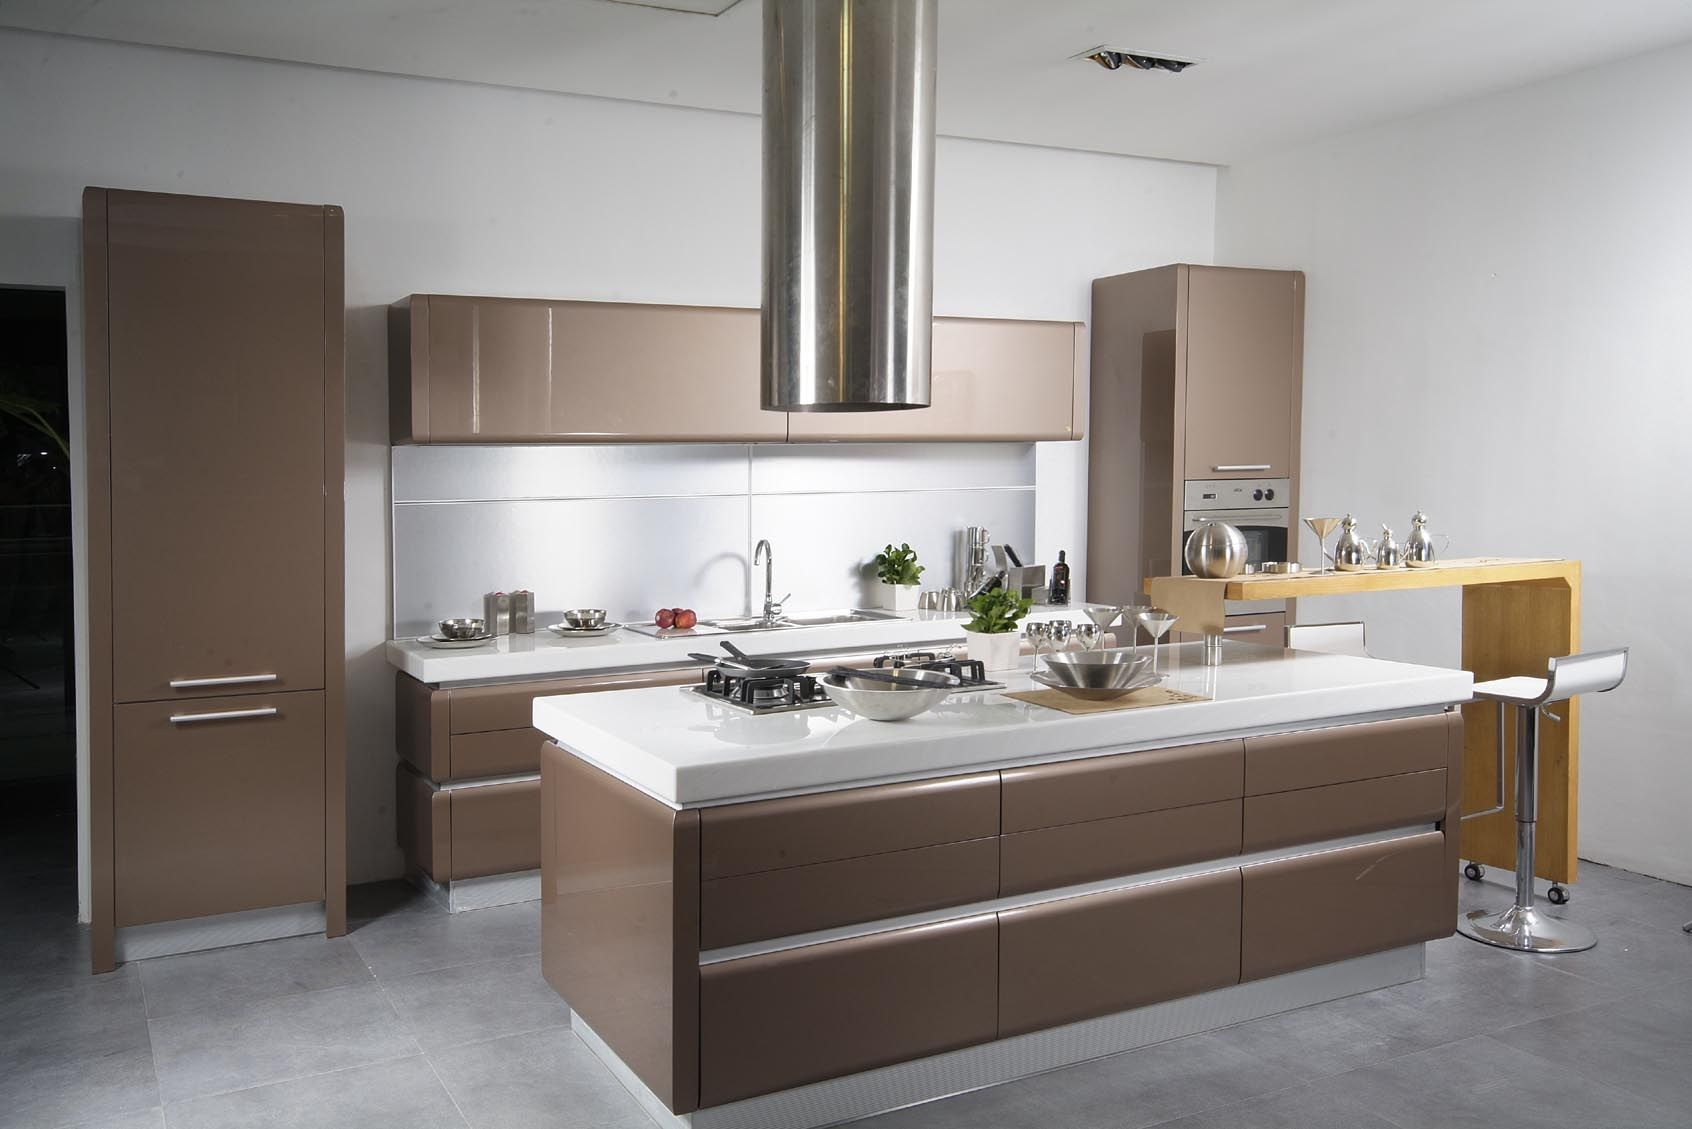 1000 Images About Modern Kitchen Design Inspiration